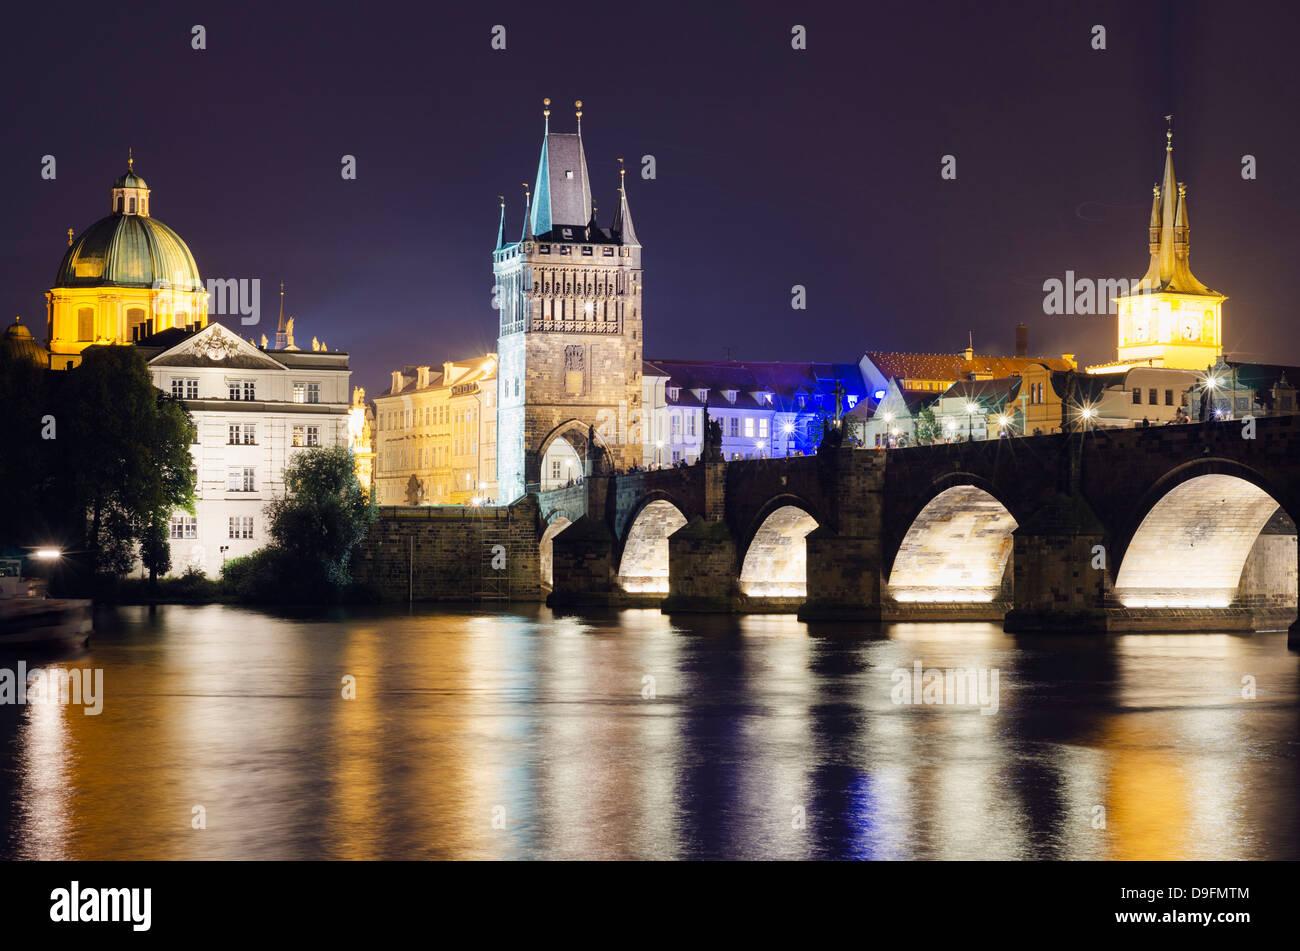 Karlsbrücke und Mala Strana Brückenturm, Weltkulturerbe, Prag, Tschechische Republik Stockbild